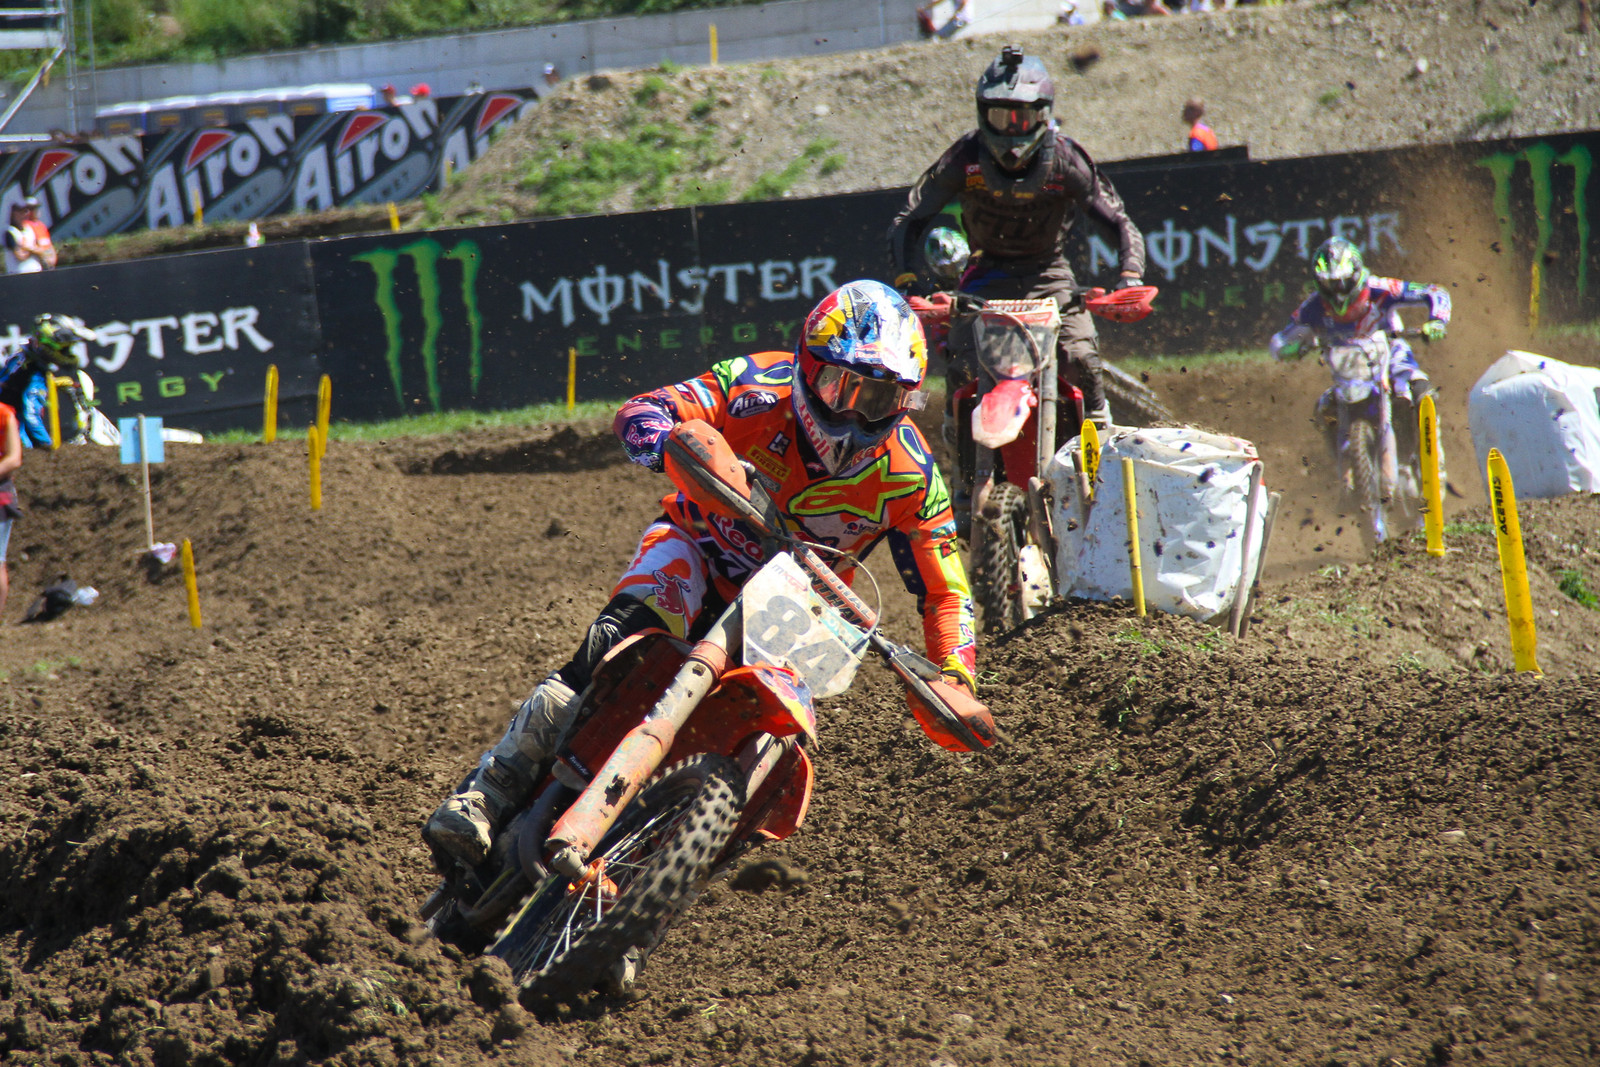 Jeffrey Herlings - ayearinmx - Motocross Pictures - Vital MX